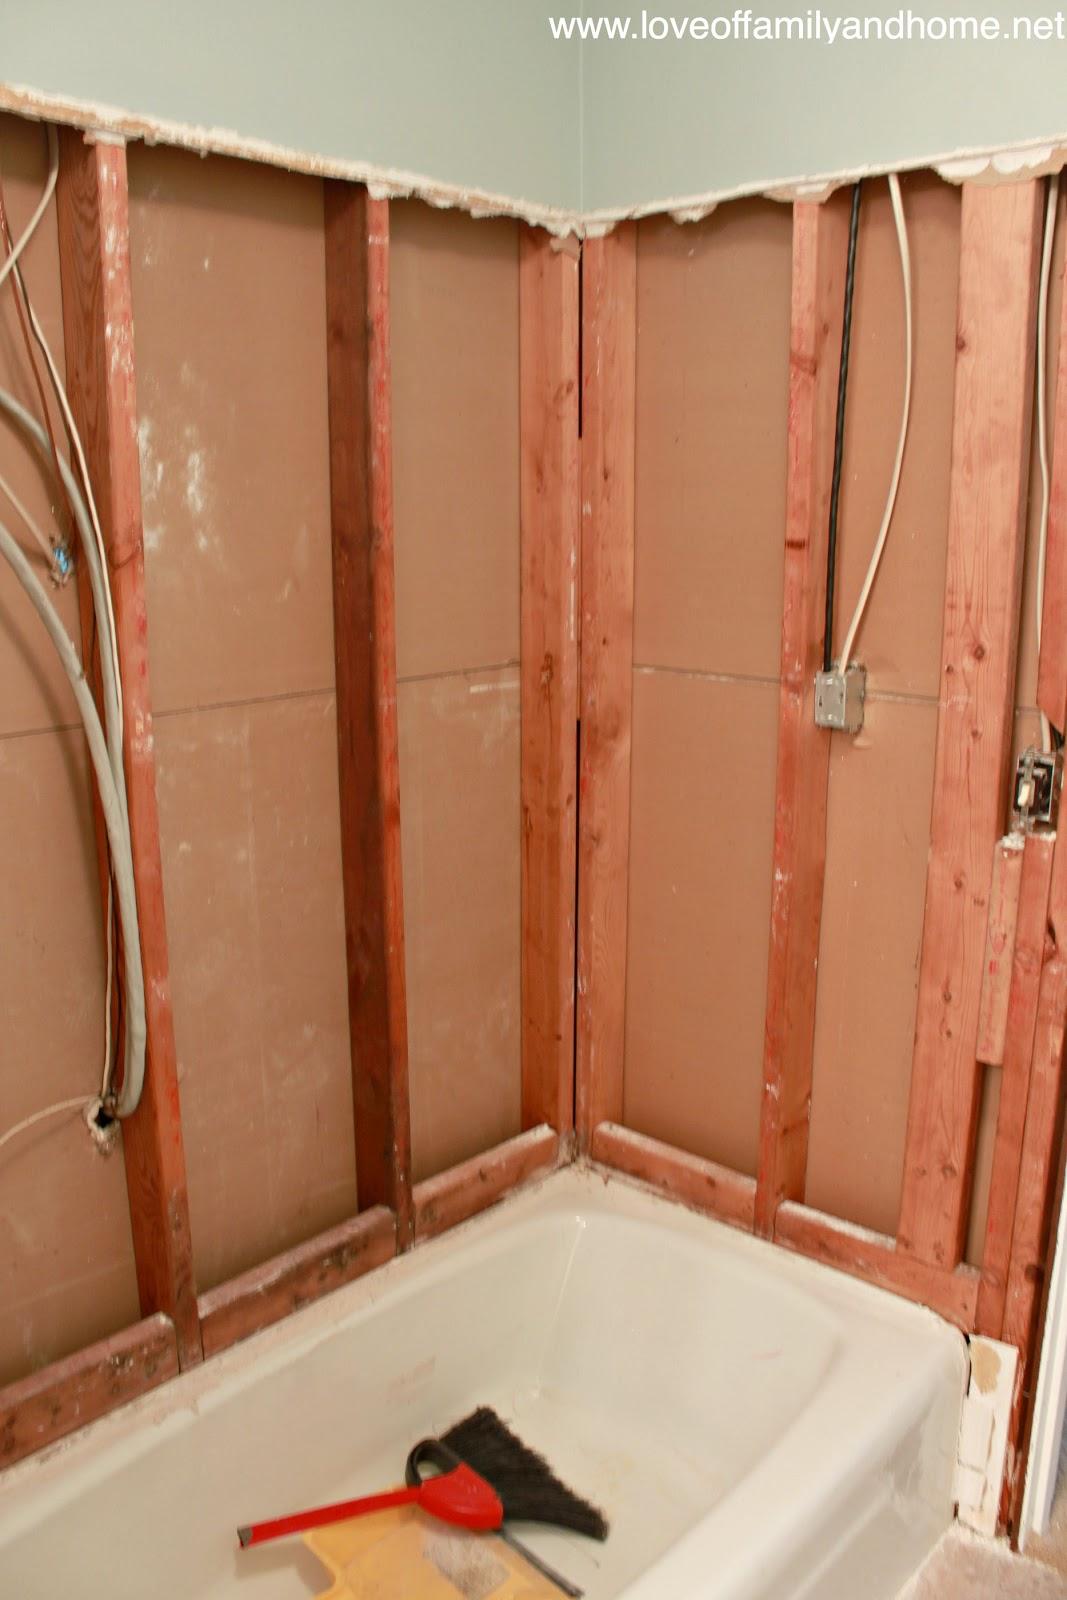 The Hallway Bathroom...Flooring U0026 A Shower Demolition   Love Of Family U0026  Home